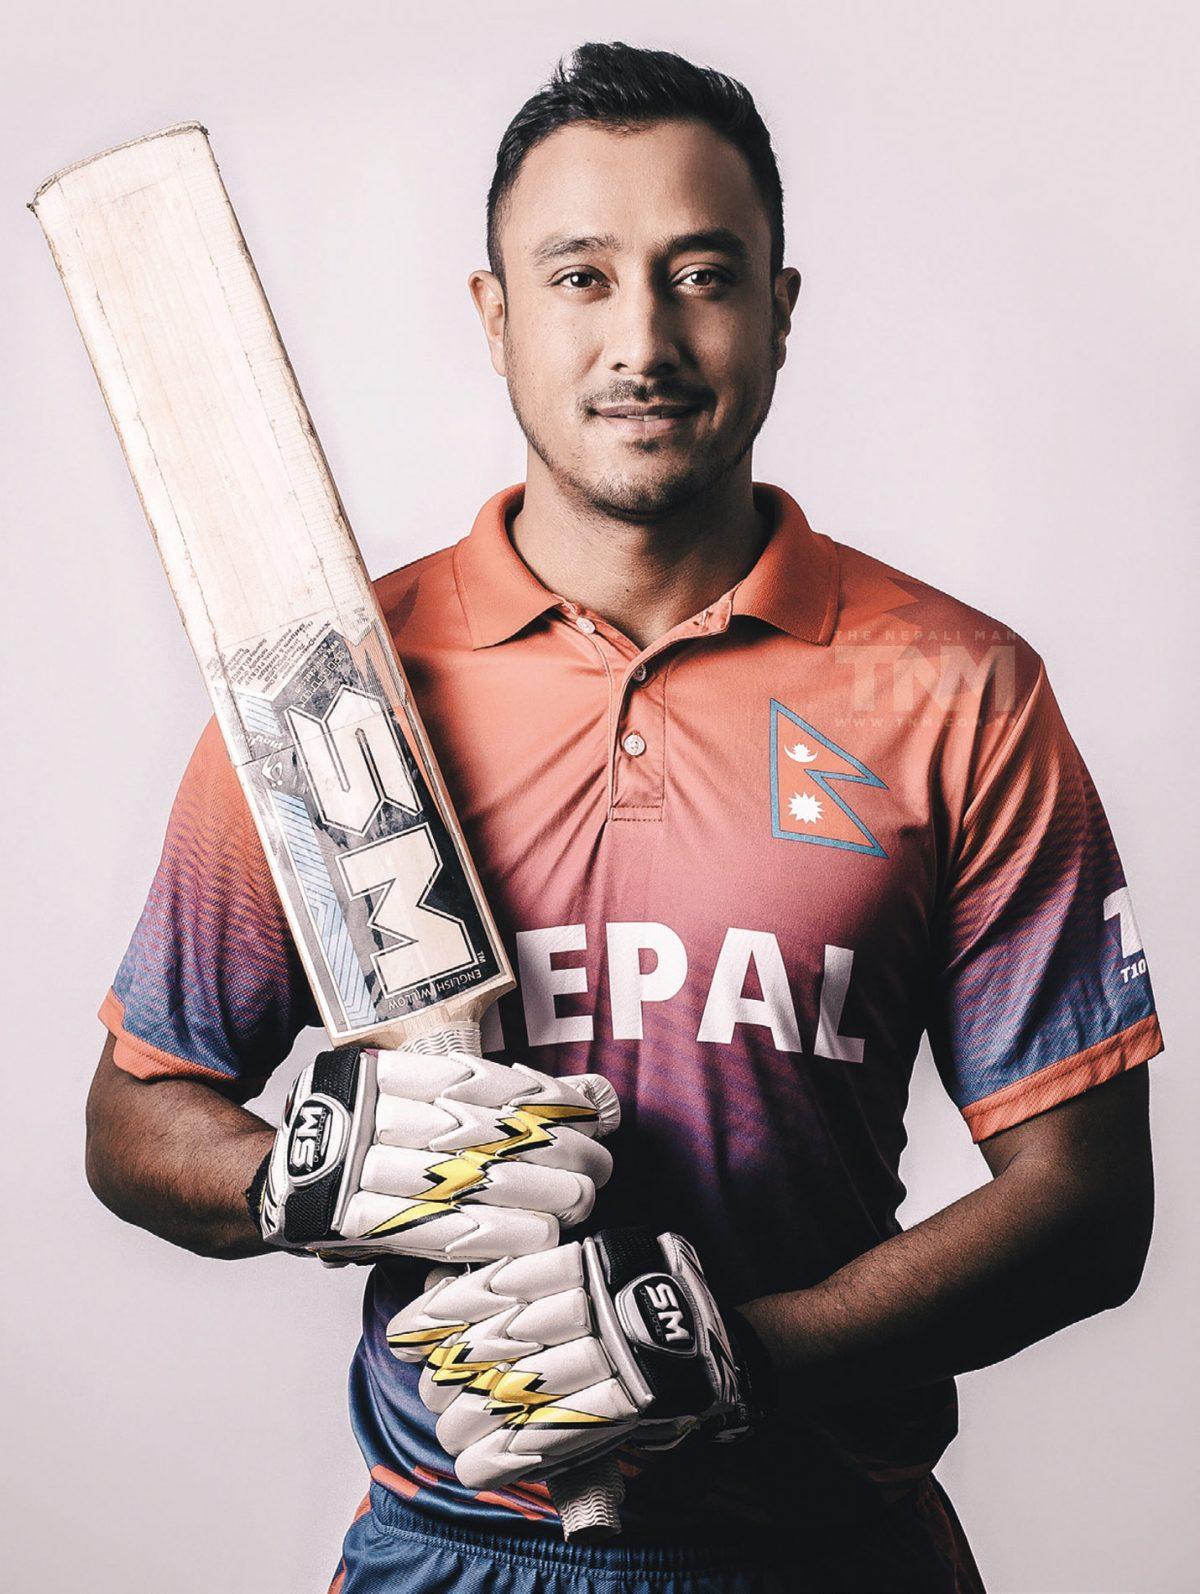 क्रिकेटका राष्ट्रिय कप्तान पारस खड्काद्धारा कप्तान पद छाड्ने घोषणा